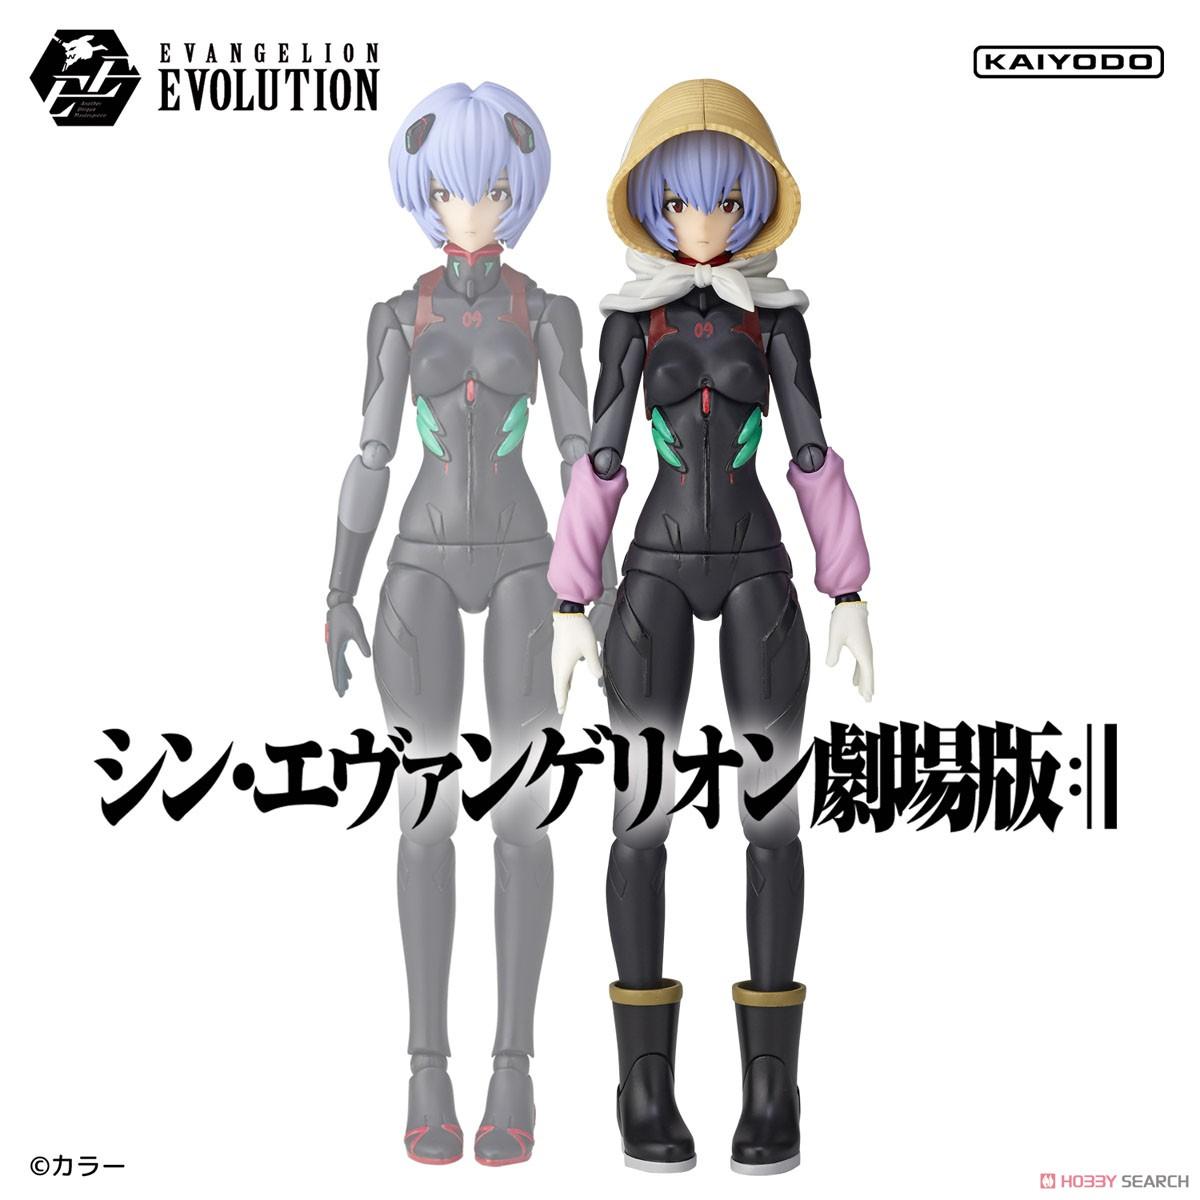 EVANGELION EVOLUTION EV-022『アヤナミレイ(仮称)第3村Ver.』シン・エヴァンゲリオン劇場版 可動フィギュア-016